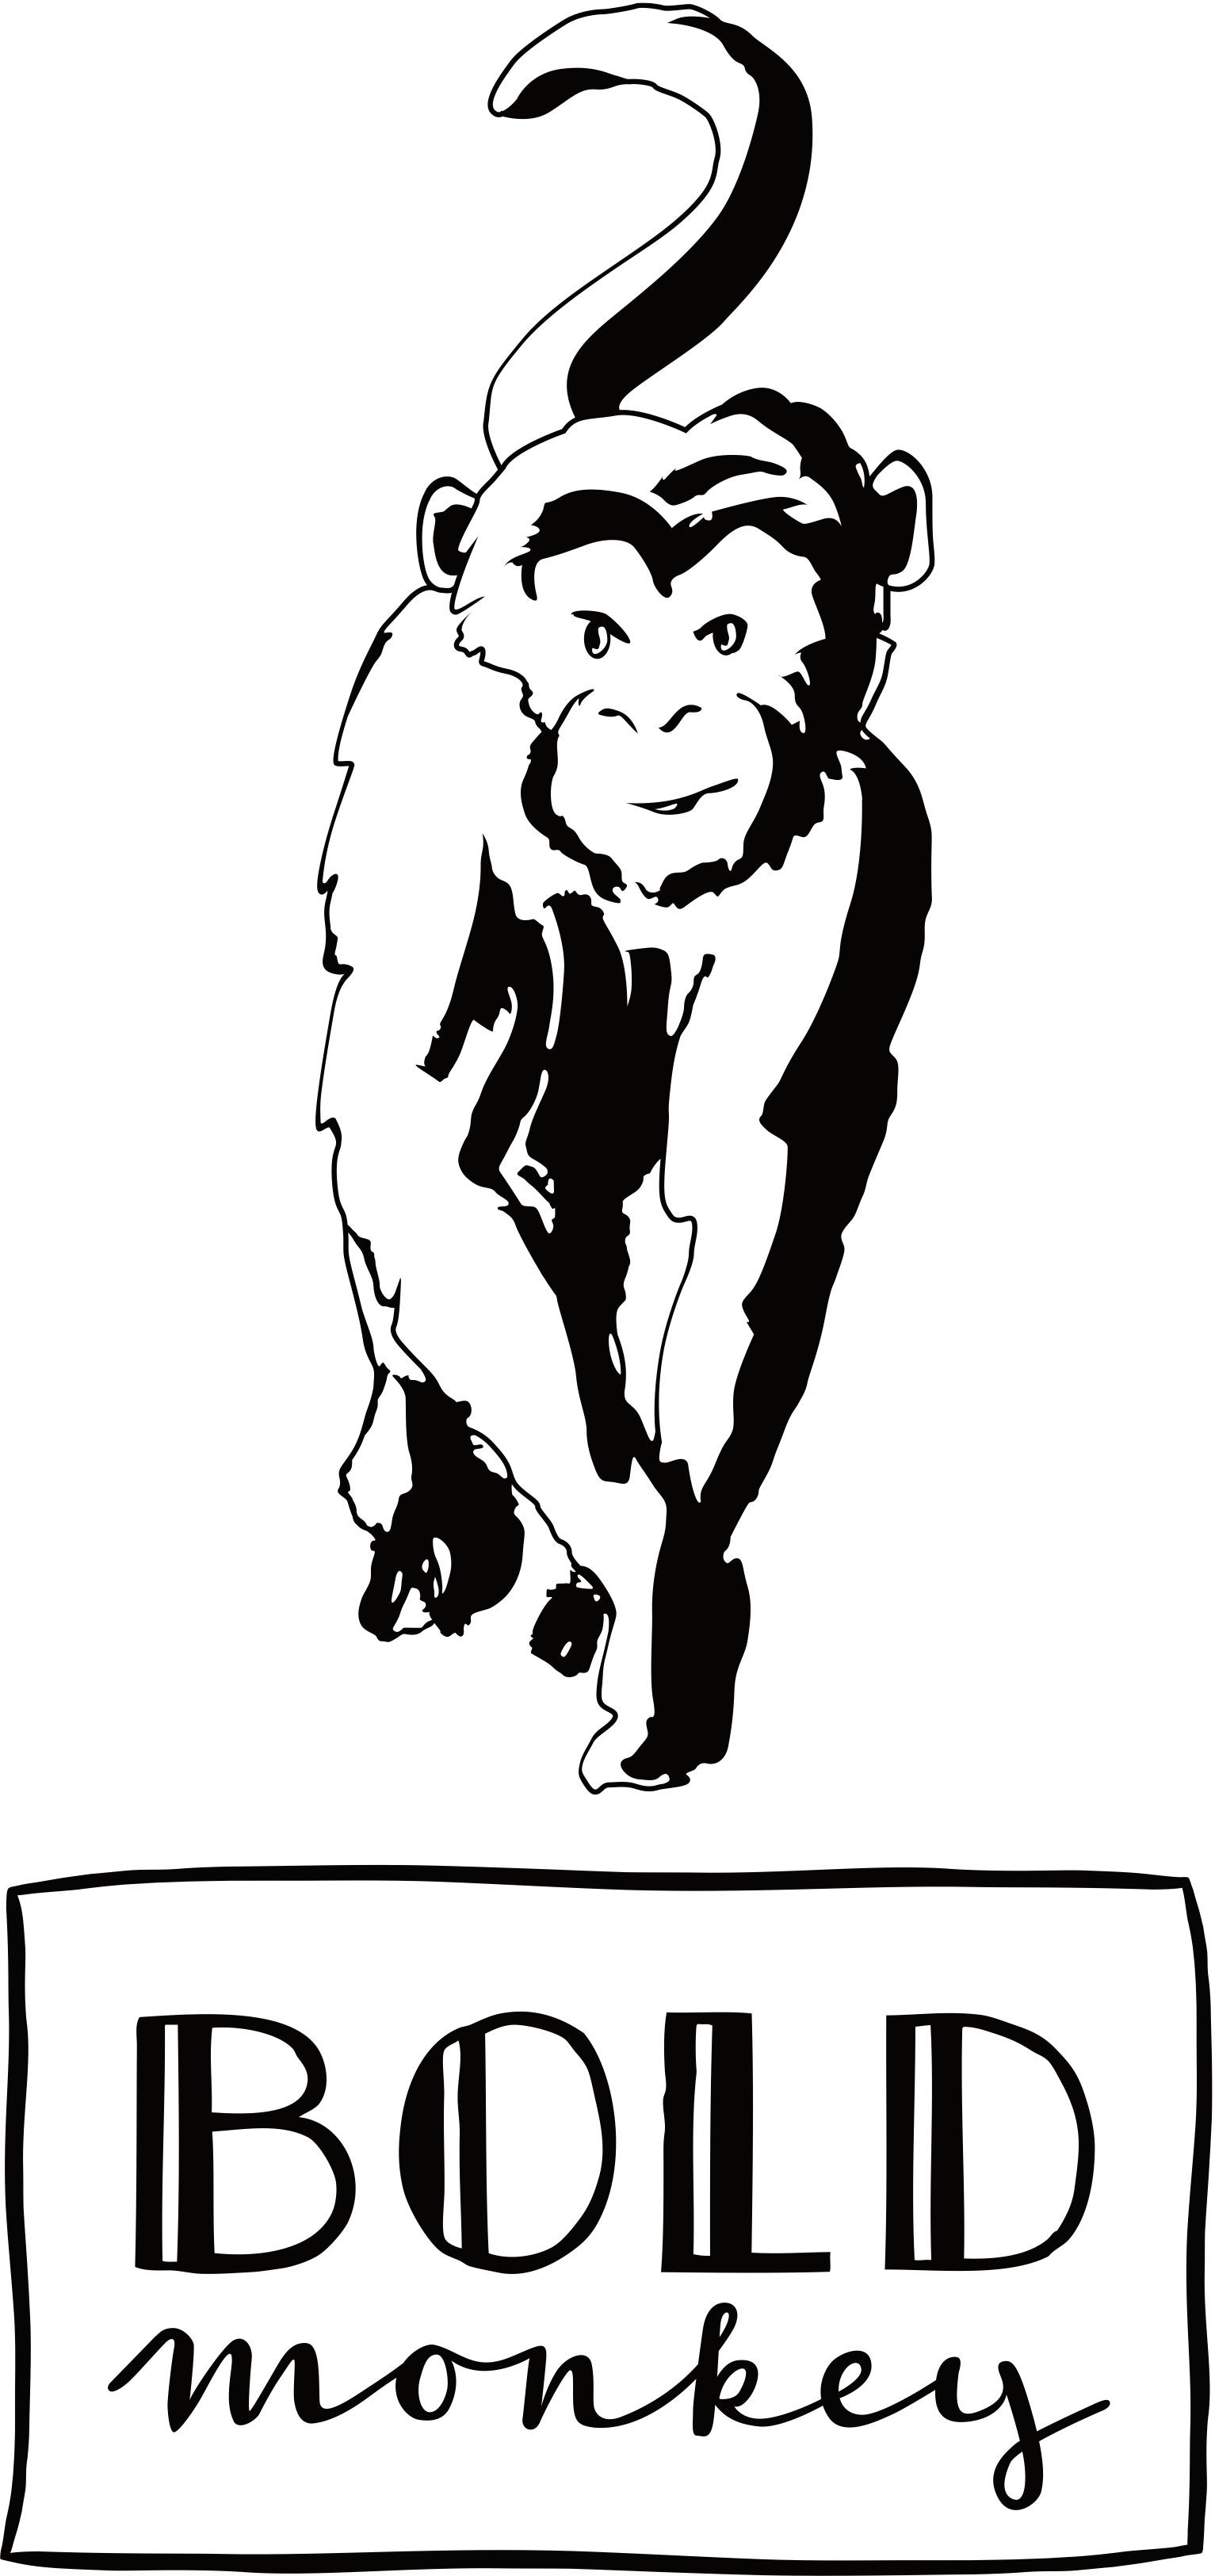 bold monkey Don't Love Me Love sofa ochre